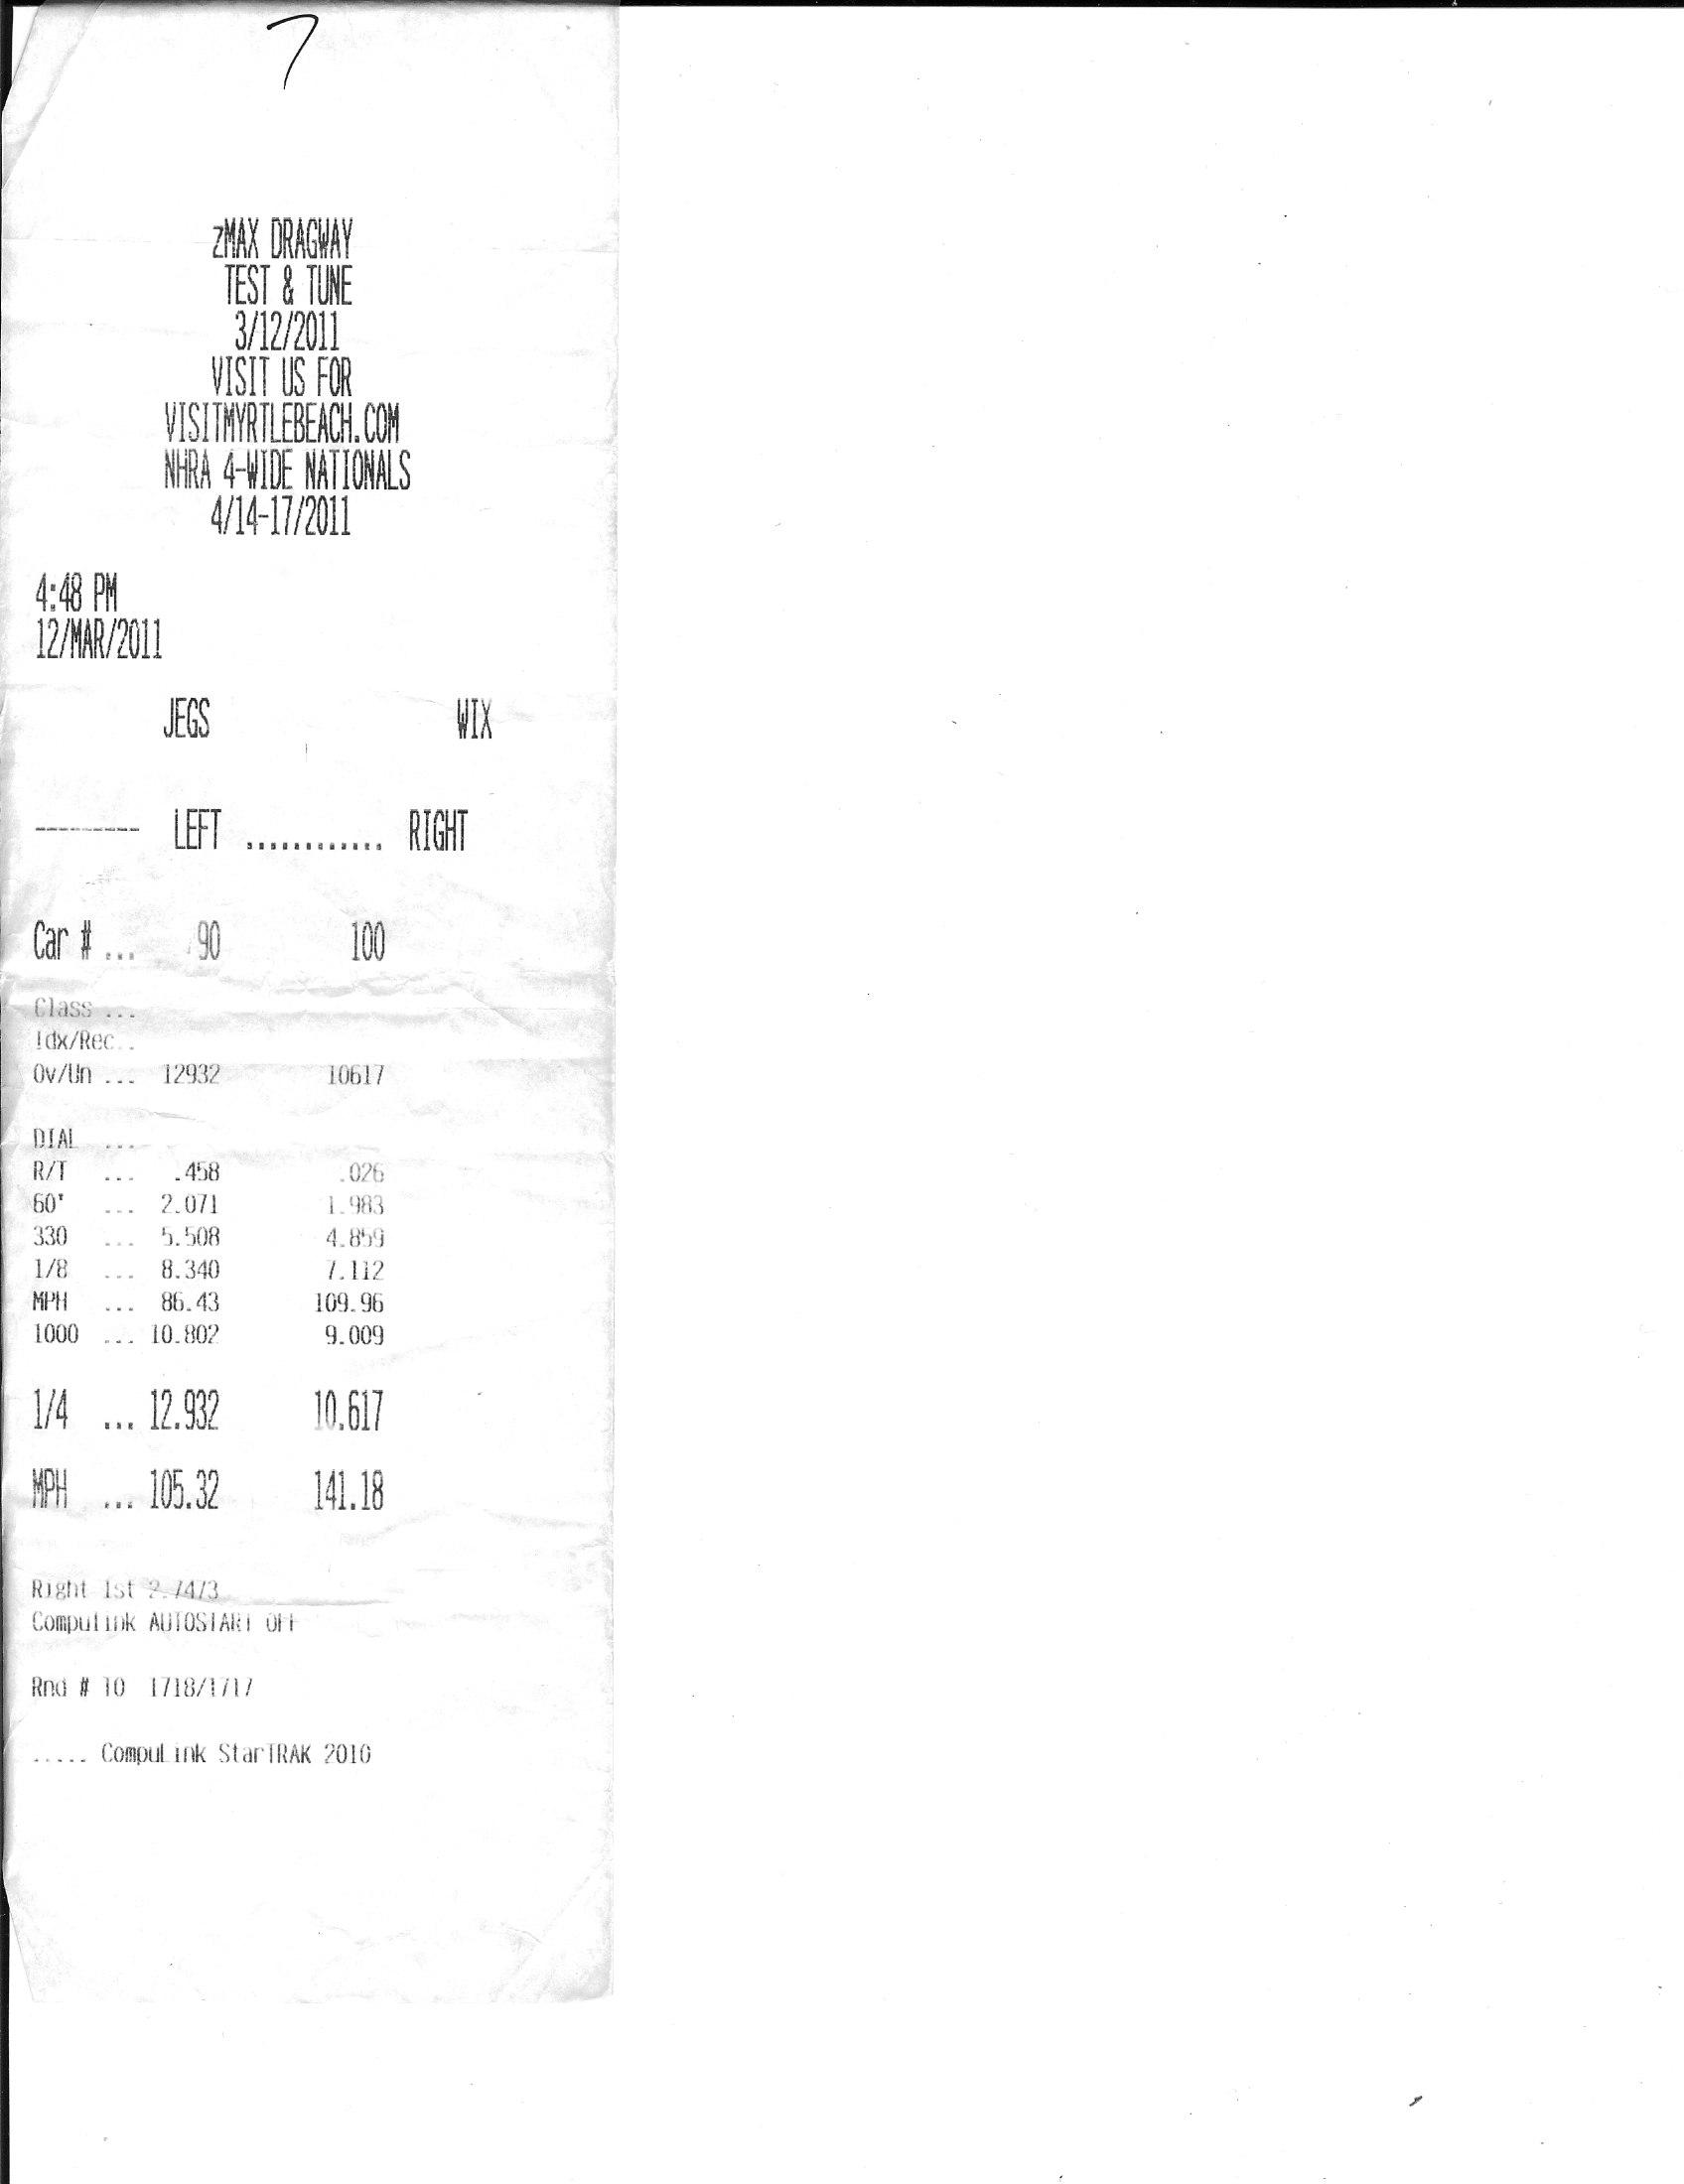 Honda VTX Timeslip Scan